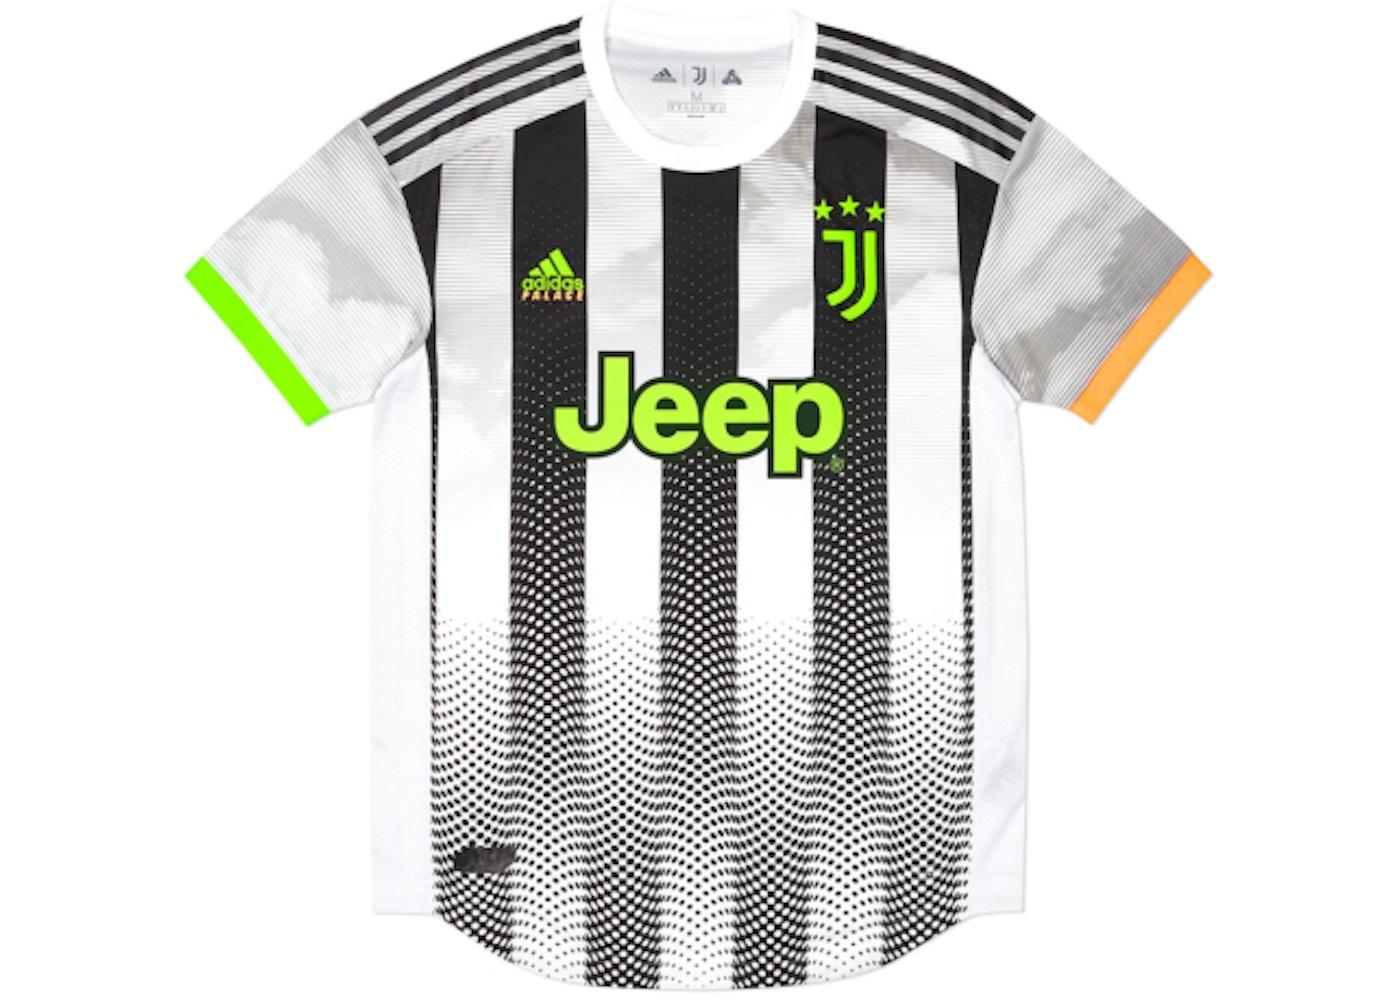 Chip De trato fácil Enajenar  Palace Adidas Palace Juventus Authentic Fourth Jersey White - FW19